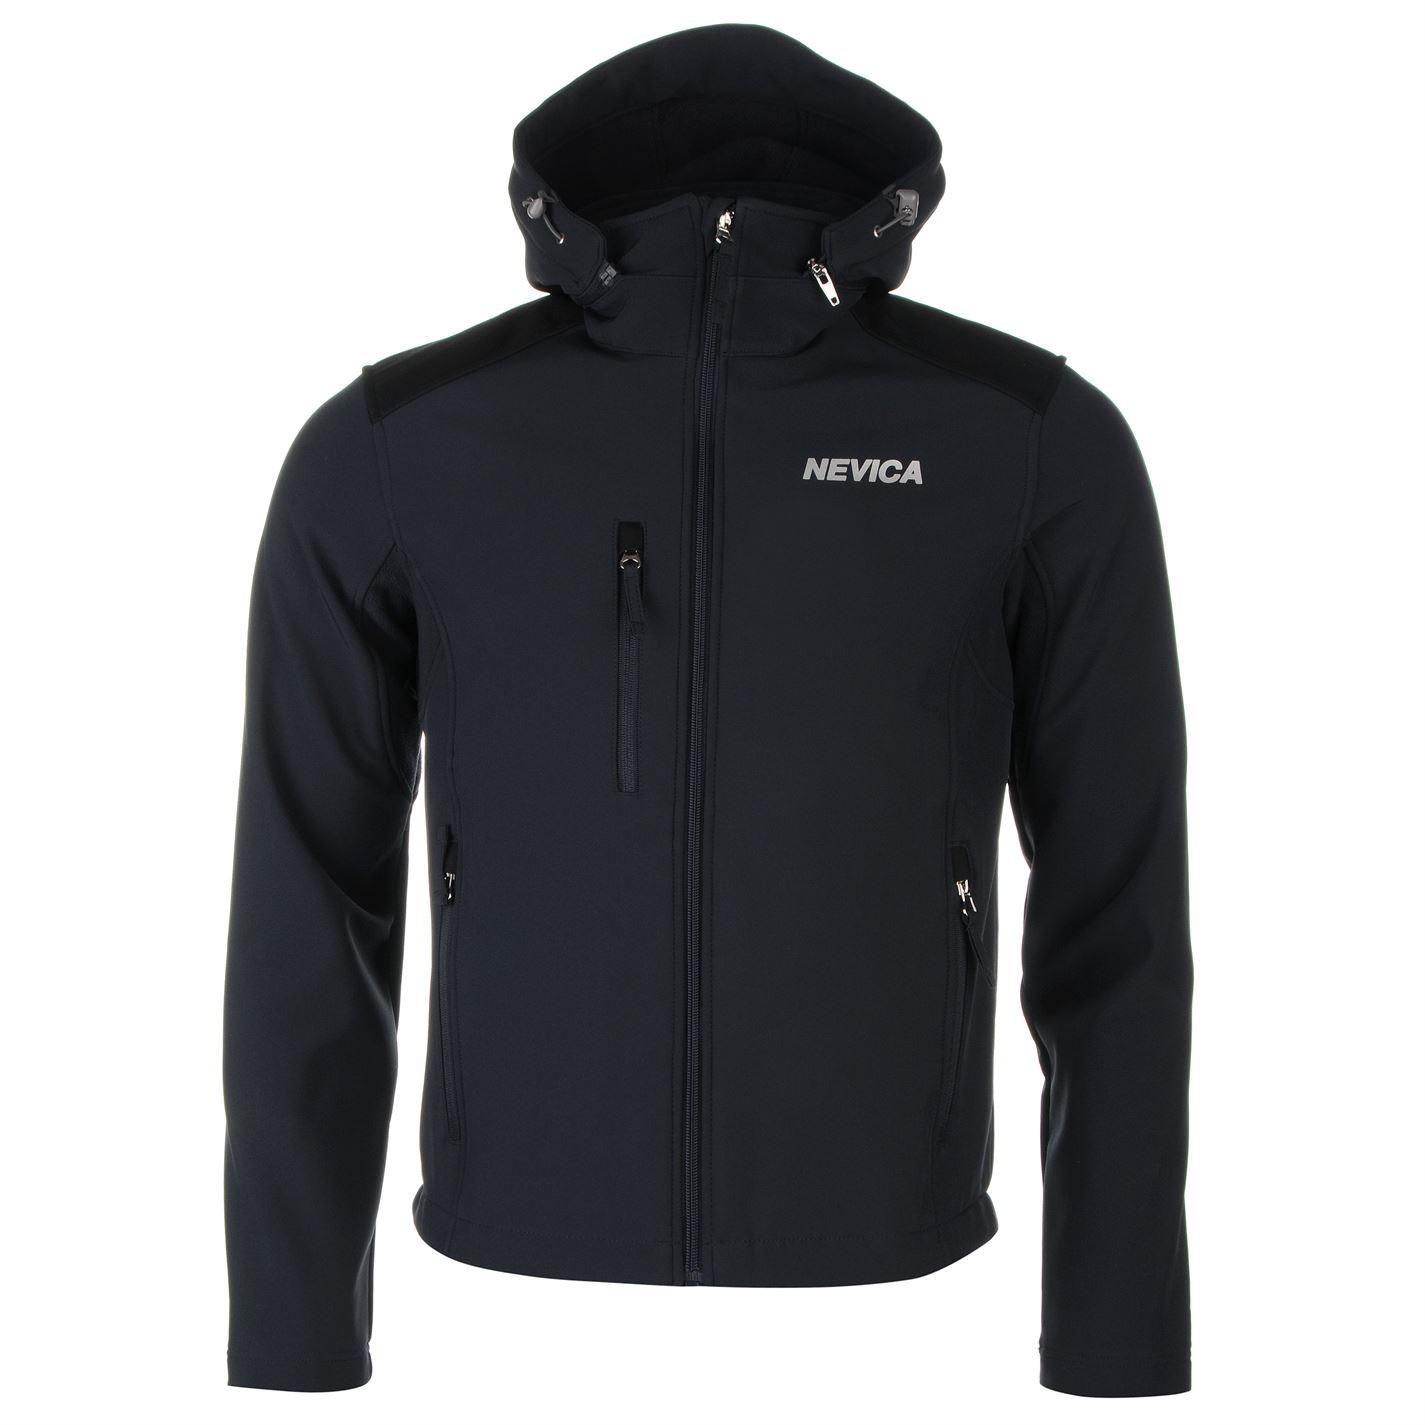 Nevica Delta Jacket Outerwear Snowboard Ski Casual Mens Gents | eBay